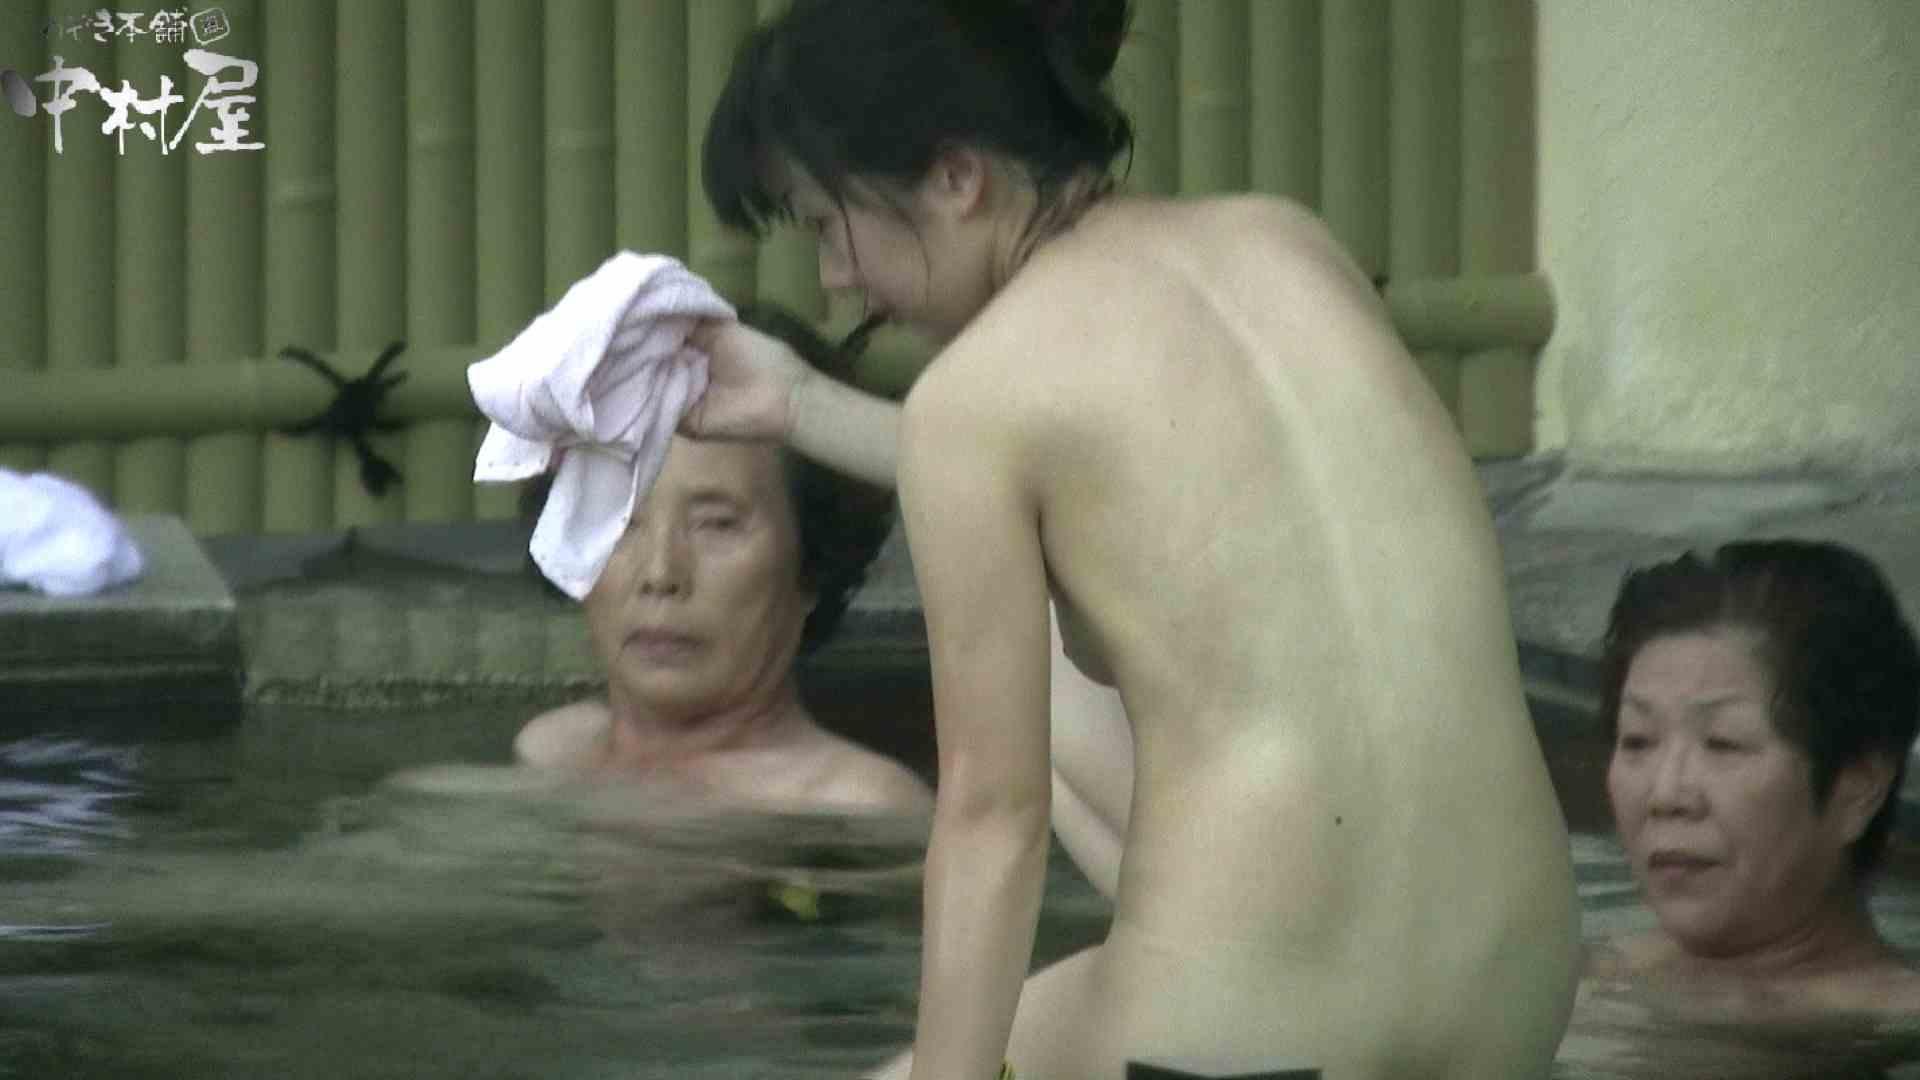 Aquaな露天風呂Vol.904 美しいOLの裸体 オメコ動画キャプチャ 103pic 2